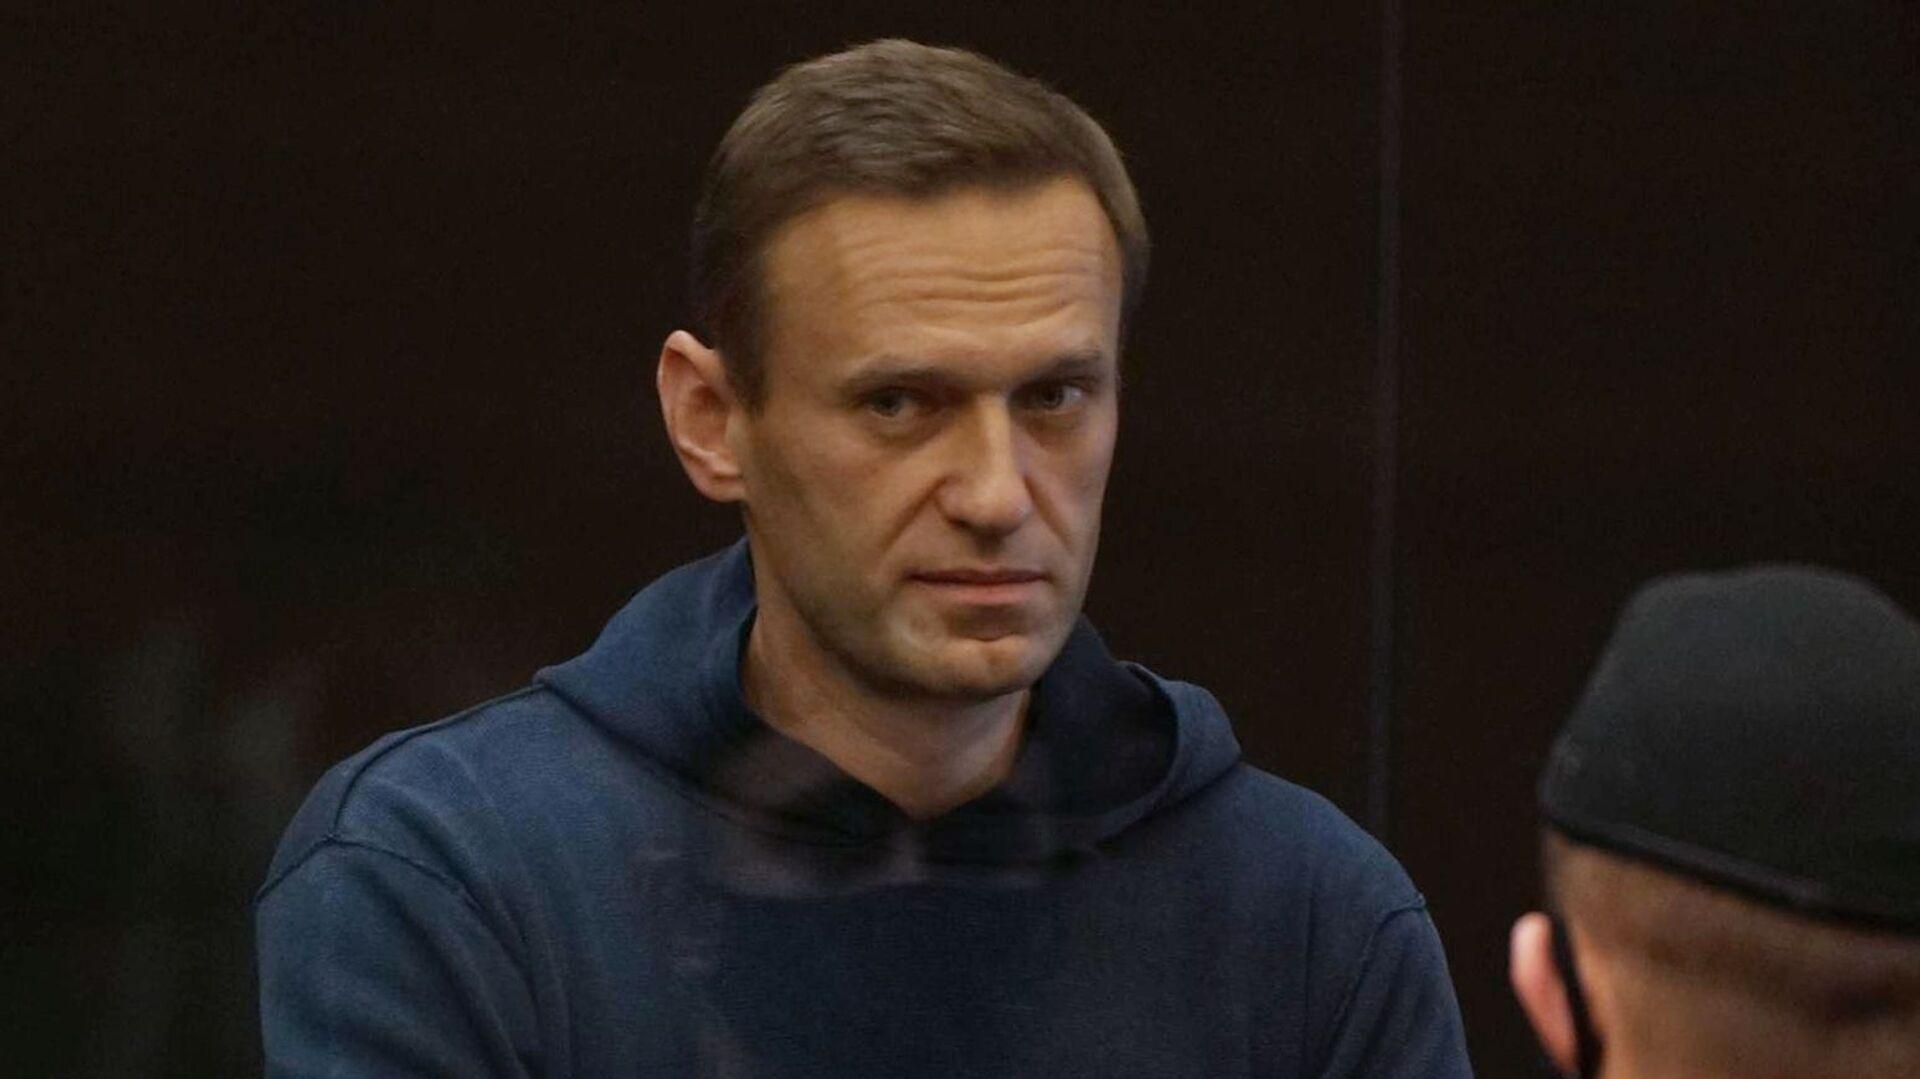 Alexéi Navalni, opositor ruso - Sputnik Mundo, 1920, 30.03.2021